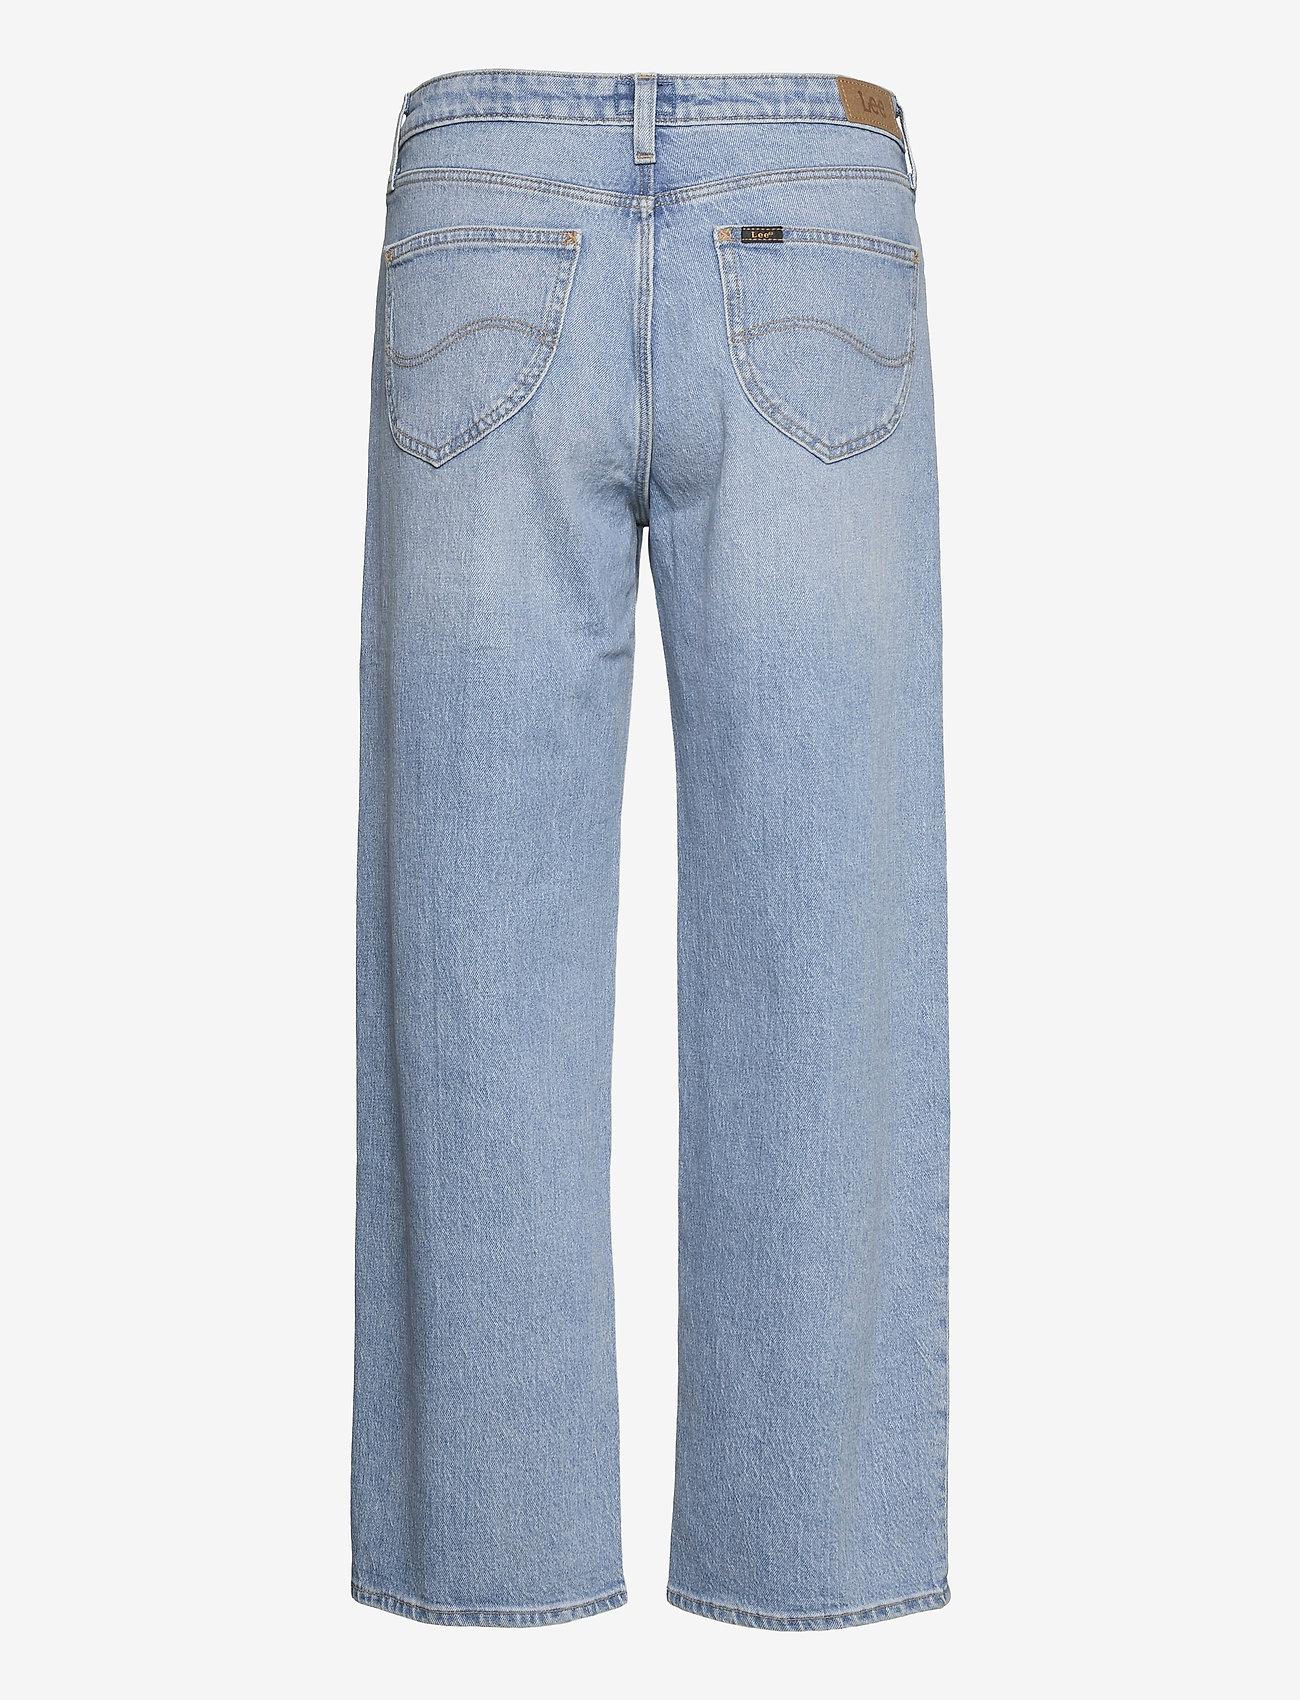 Lee Jeans - WIDE LEG - brede jeans - mid soho - 1